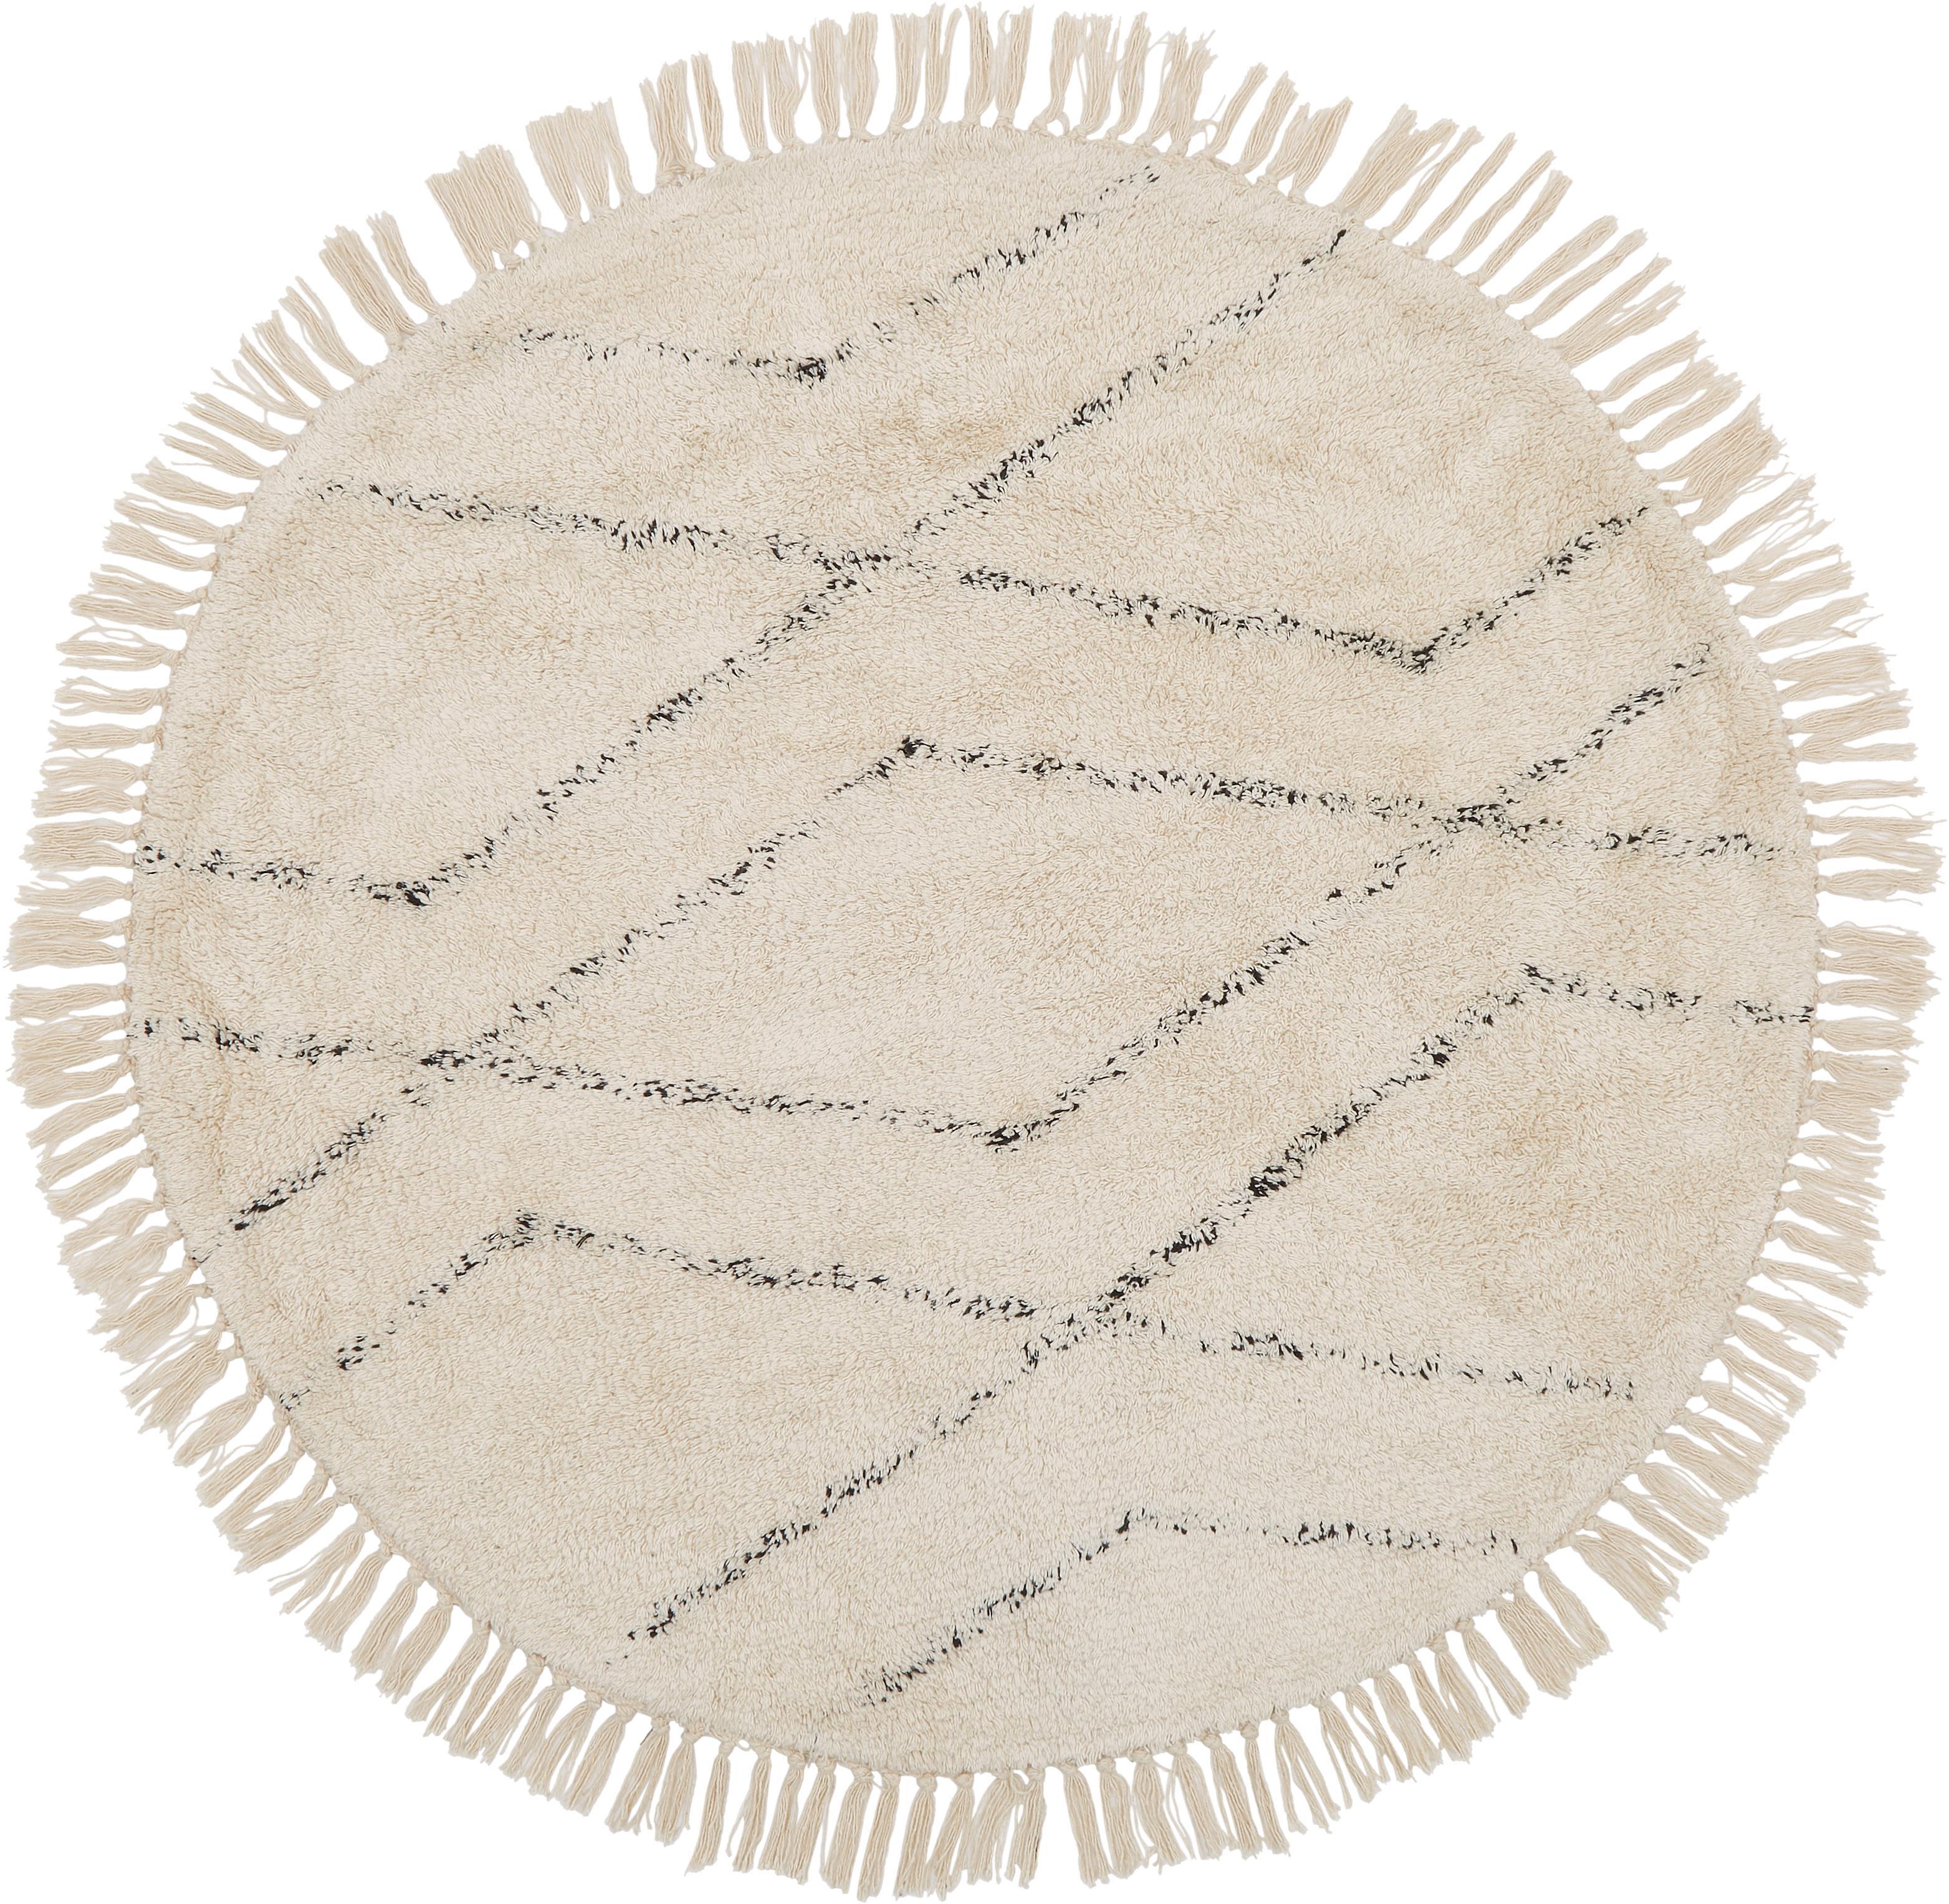 Alfombra redonda artesanal de algodón Bina, Beige, negro, Ø 110 cm (Tamaño S)